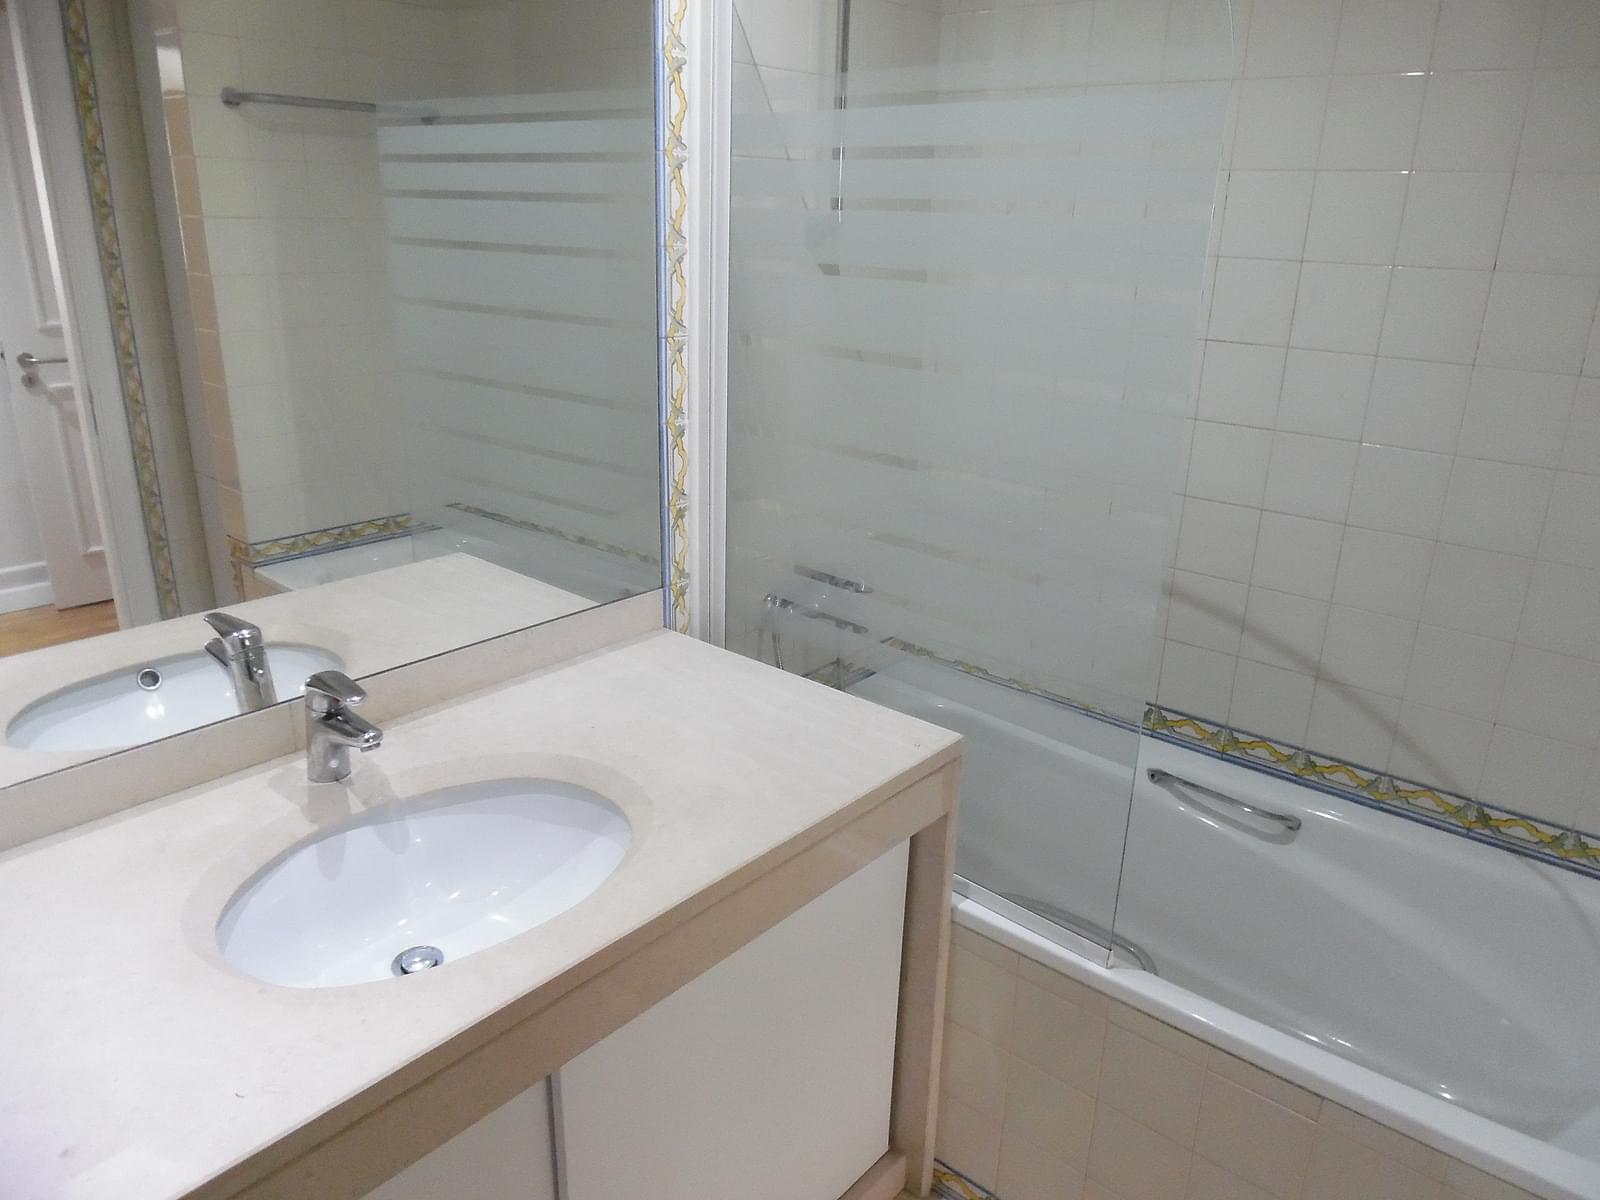 pf17637-apartamento-t2-lisboa-14f91ba6-3c1d-43cb-ae72-ca57b3d707dc